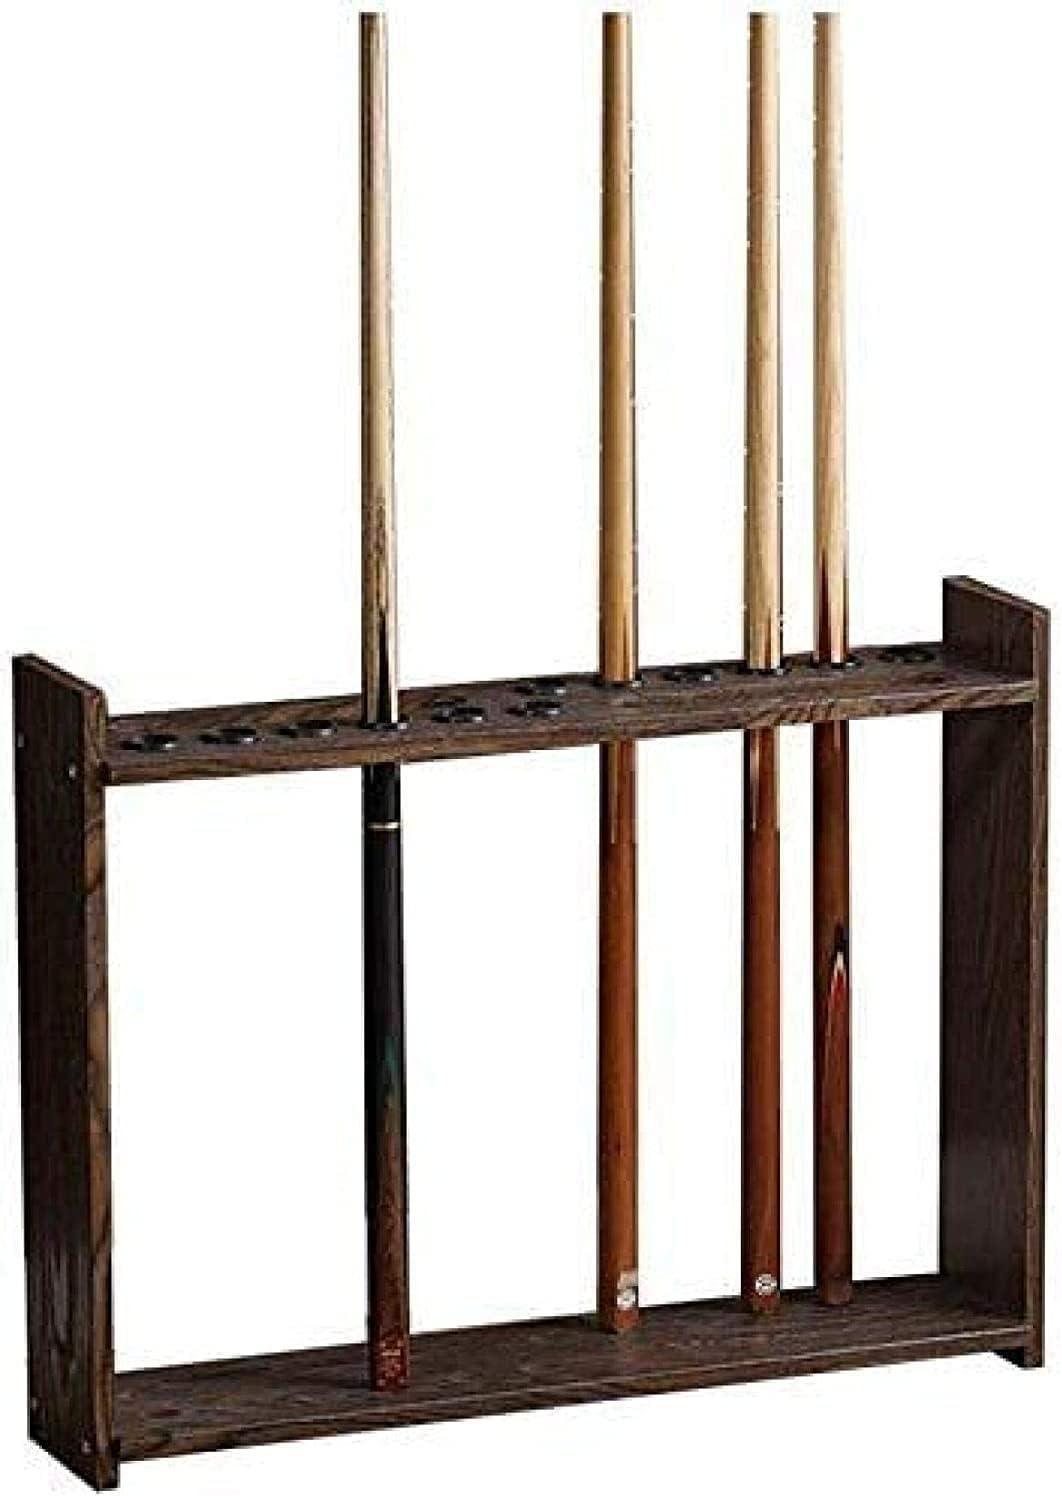 LCBOOST0916 Billiard free Cue Storage Rack Vertical Holder Stick Pool Daily bargain sale